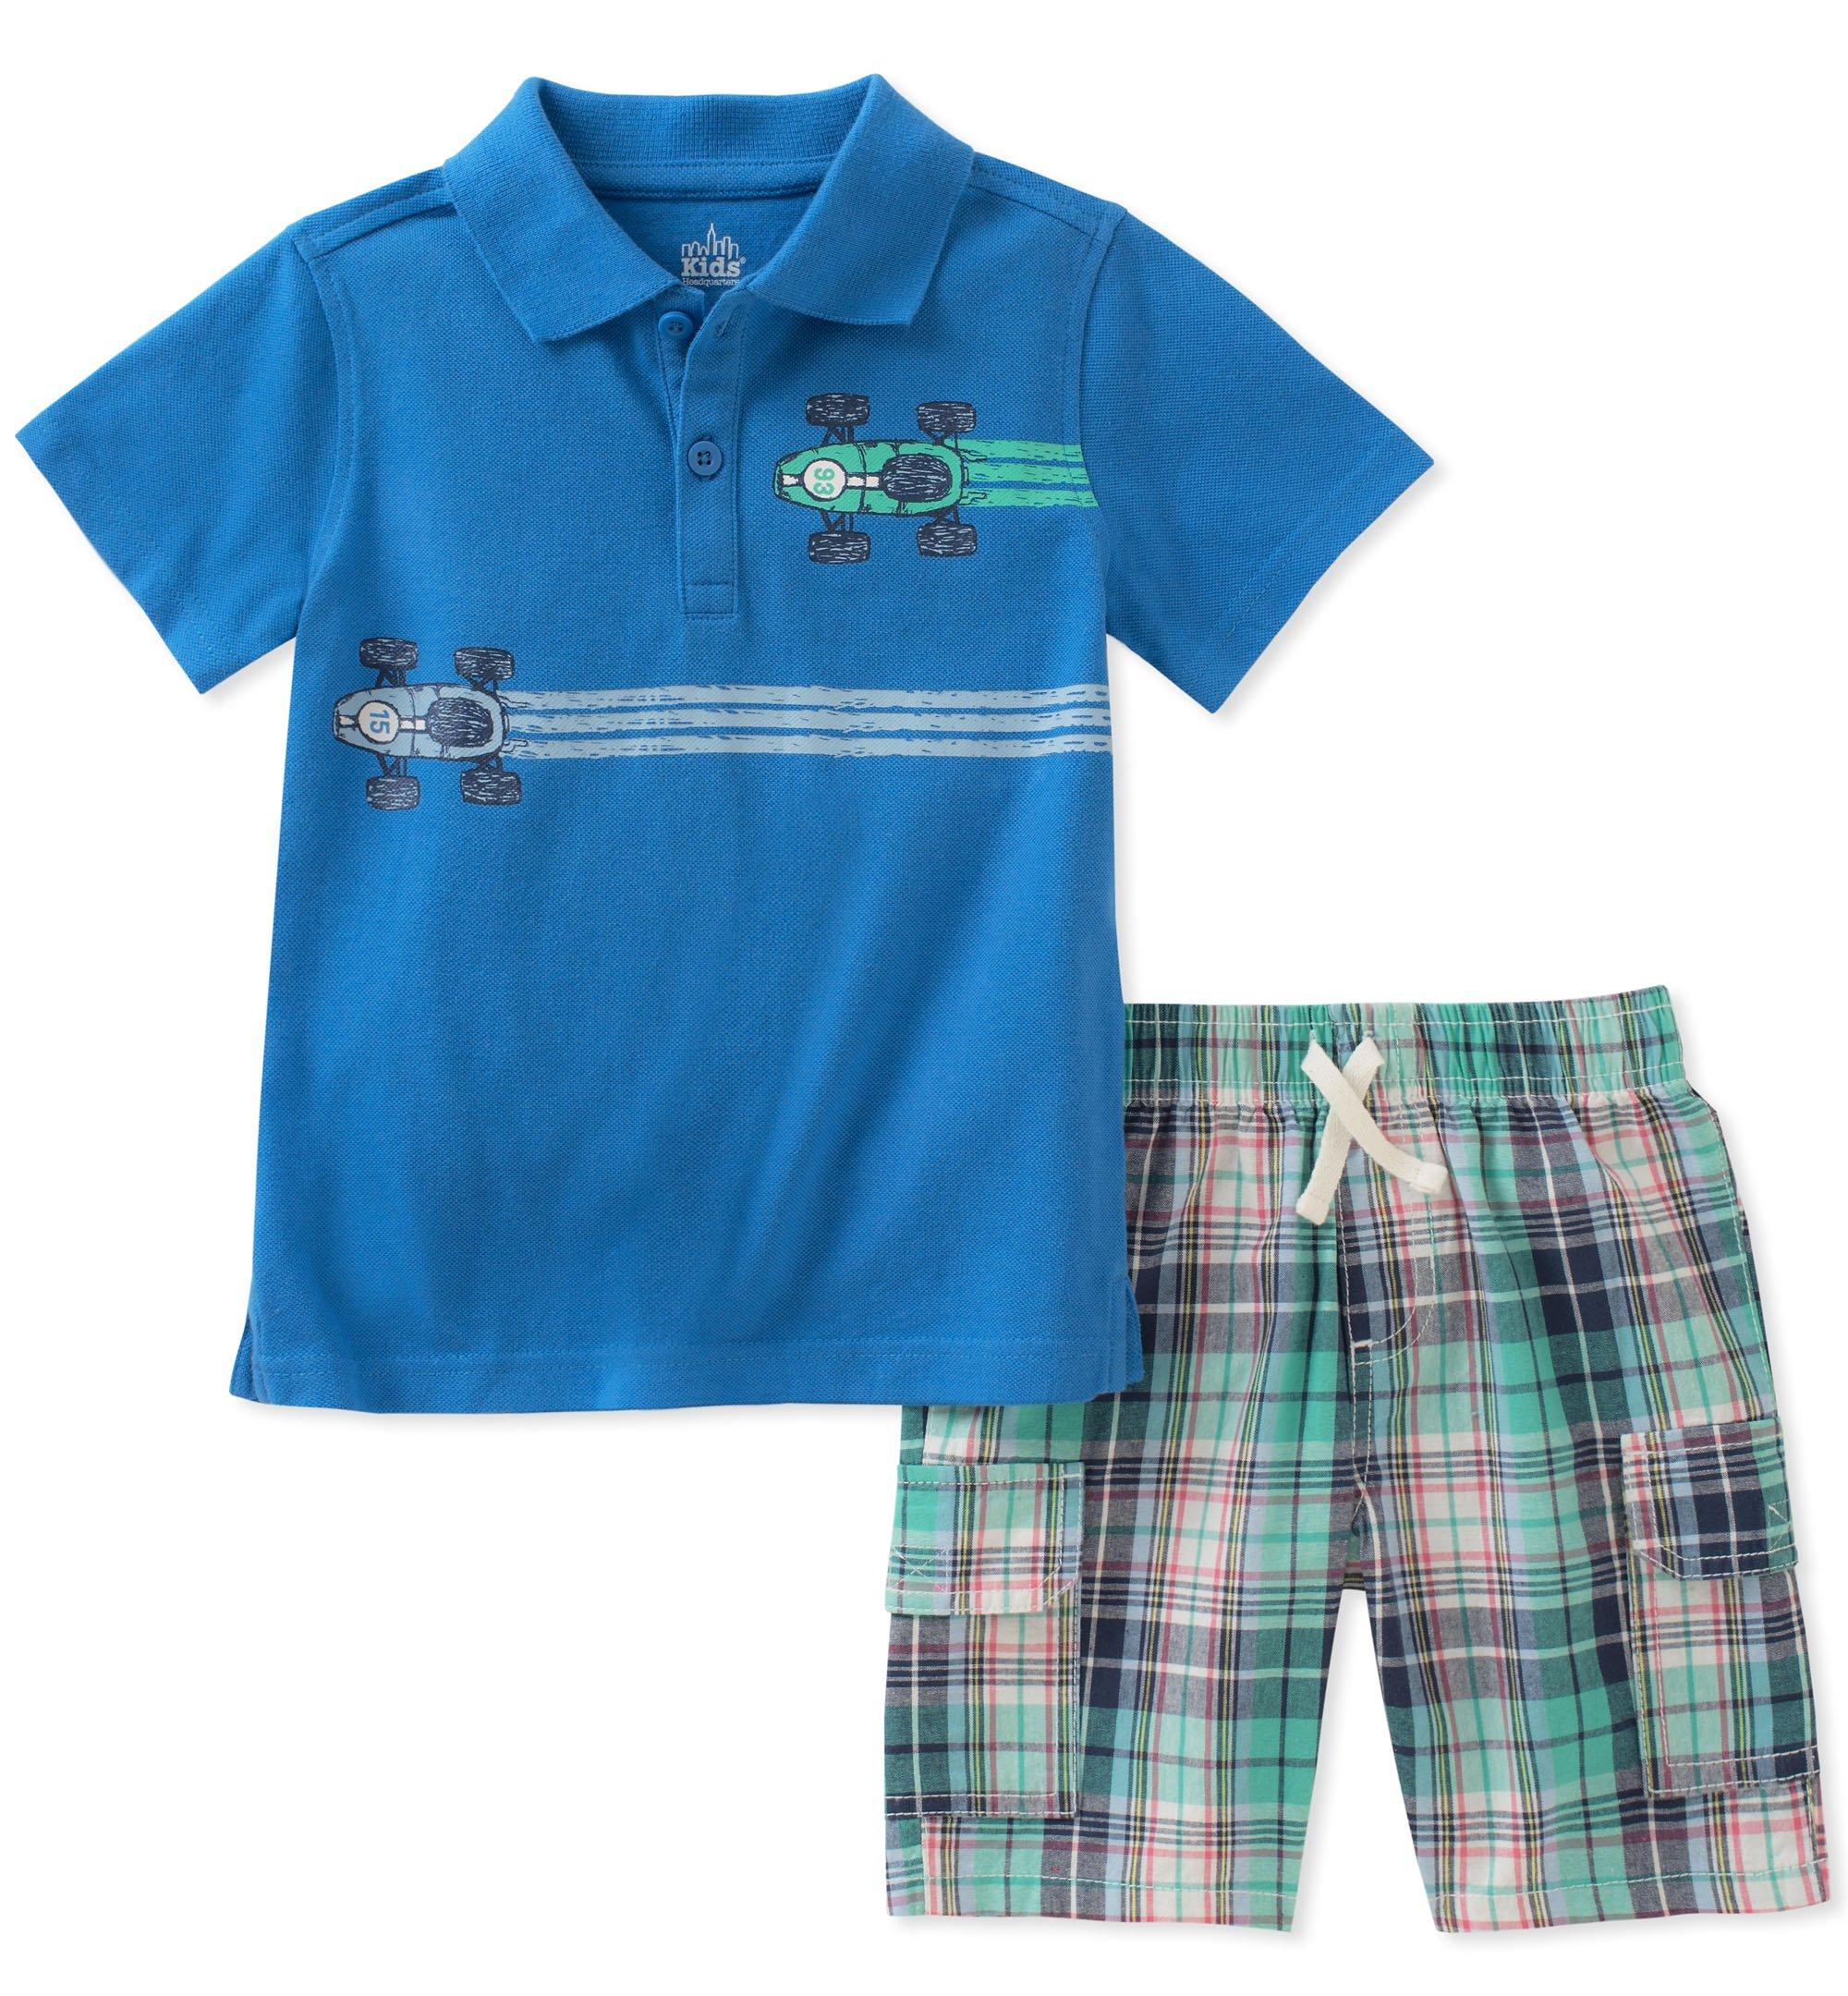 Kids Headquarters Boys' Toddler 2 Pieces Polo Shorts Set, Blue, 2T